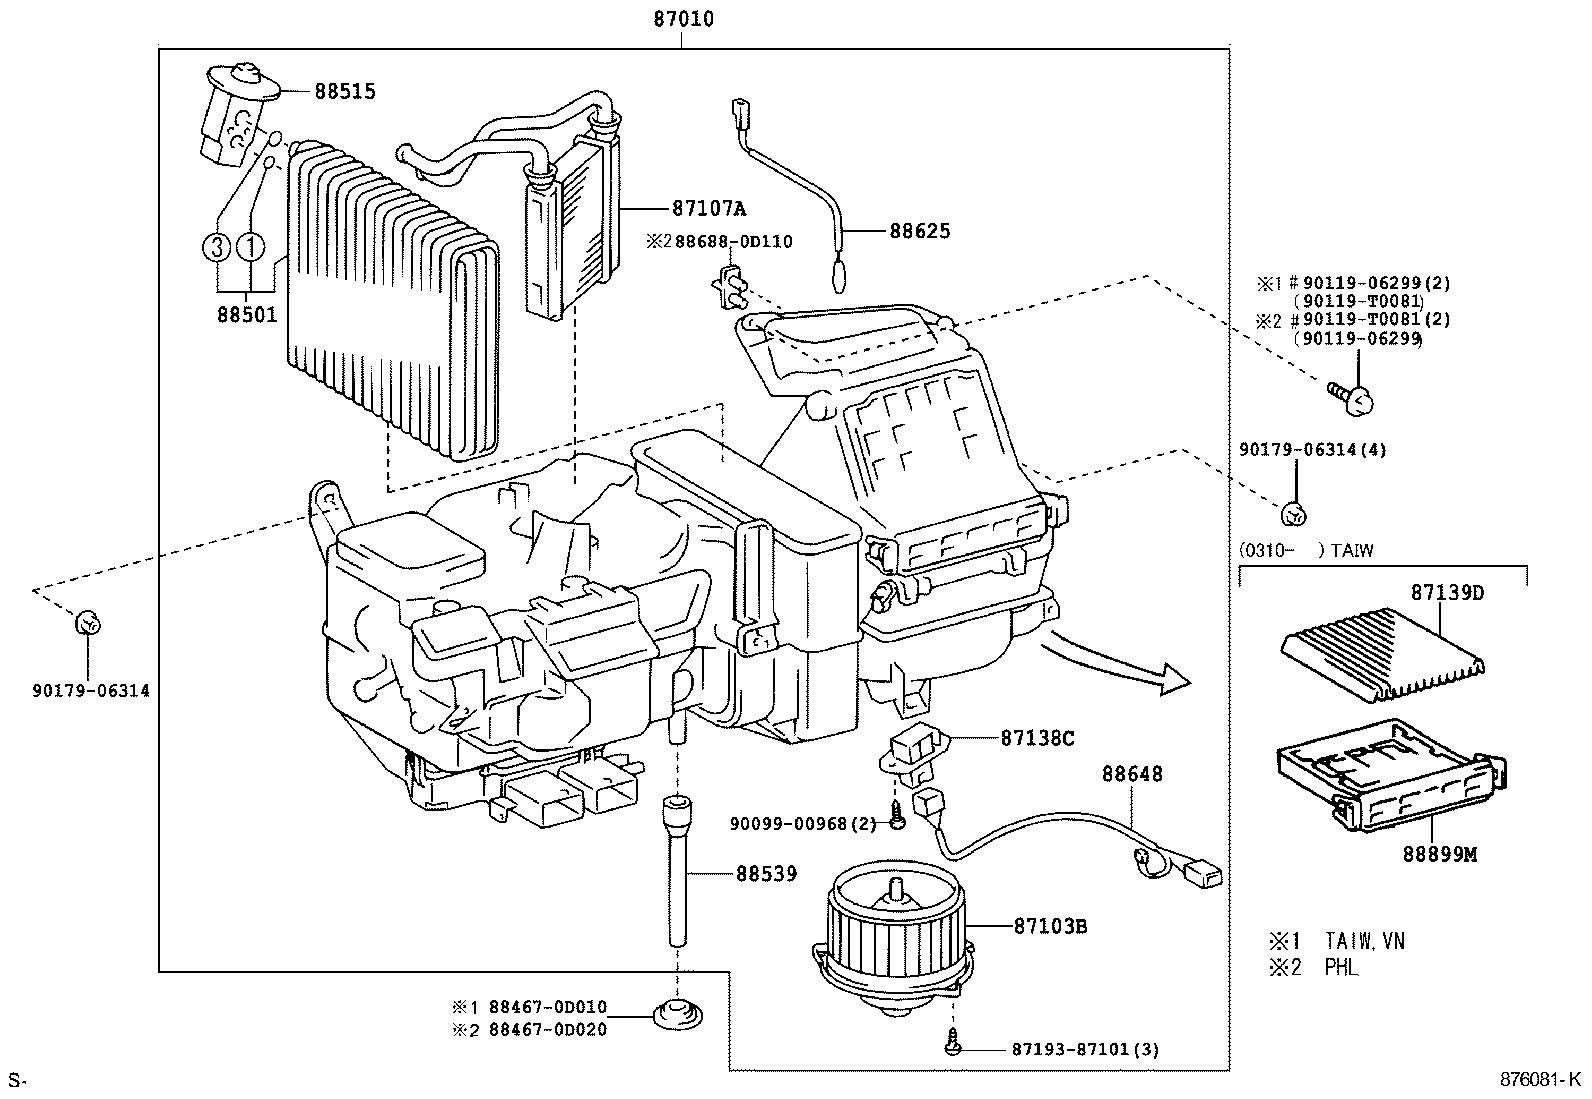 toyota vios soluna viosncp42l-eepekr - electrical